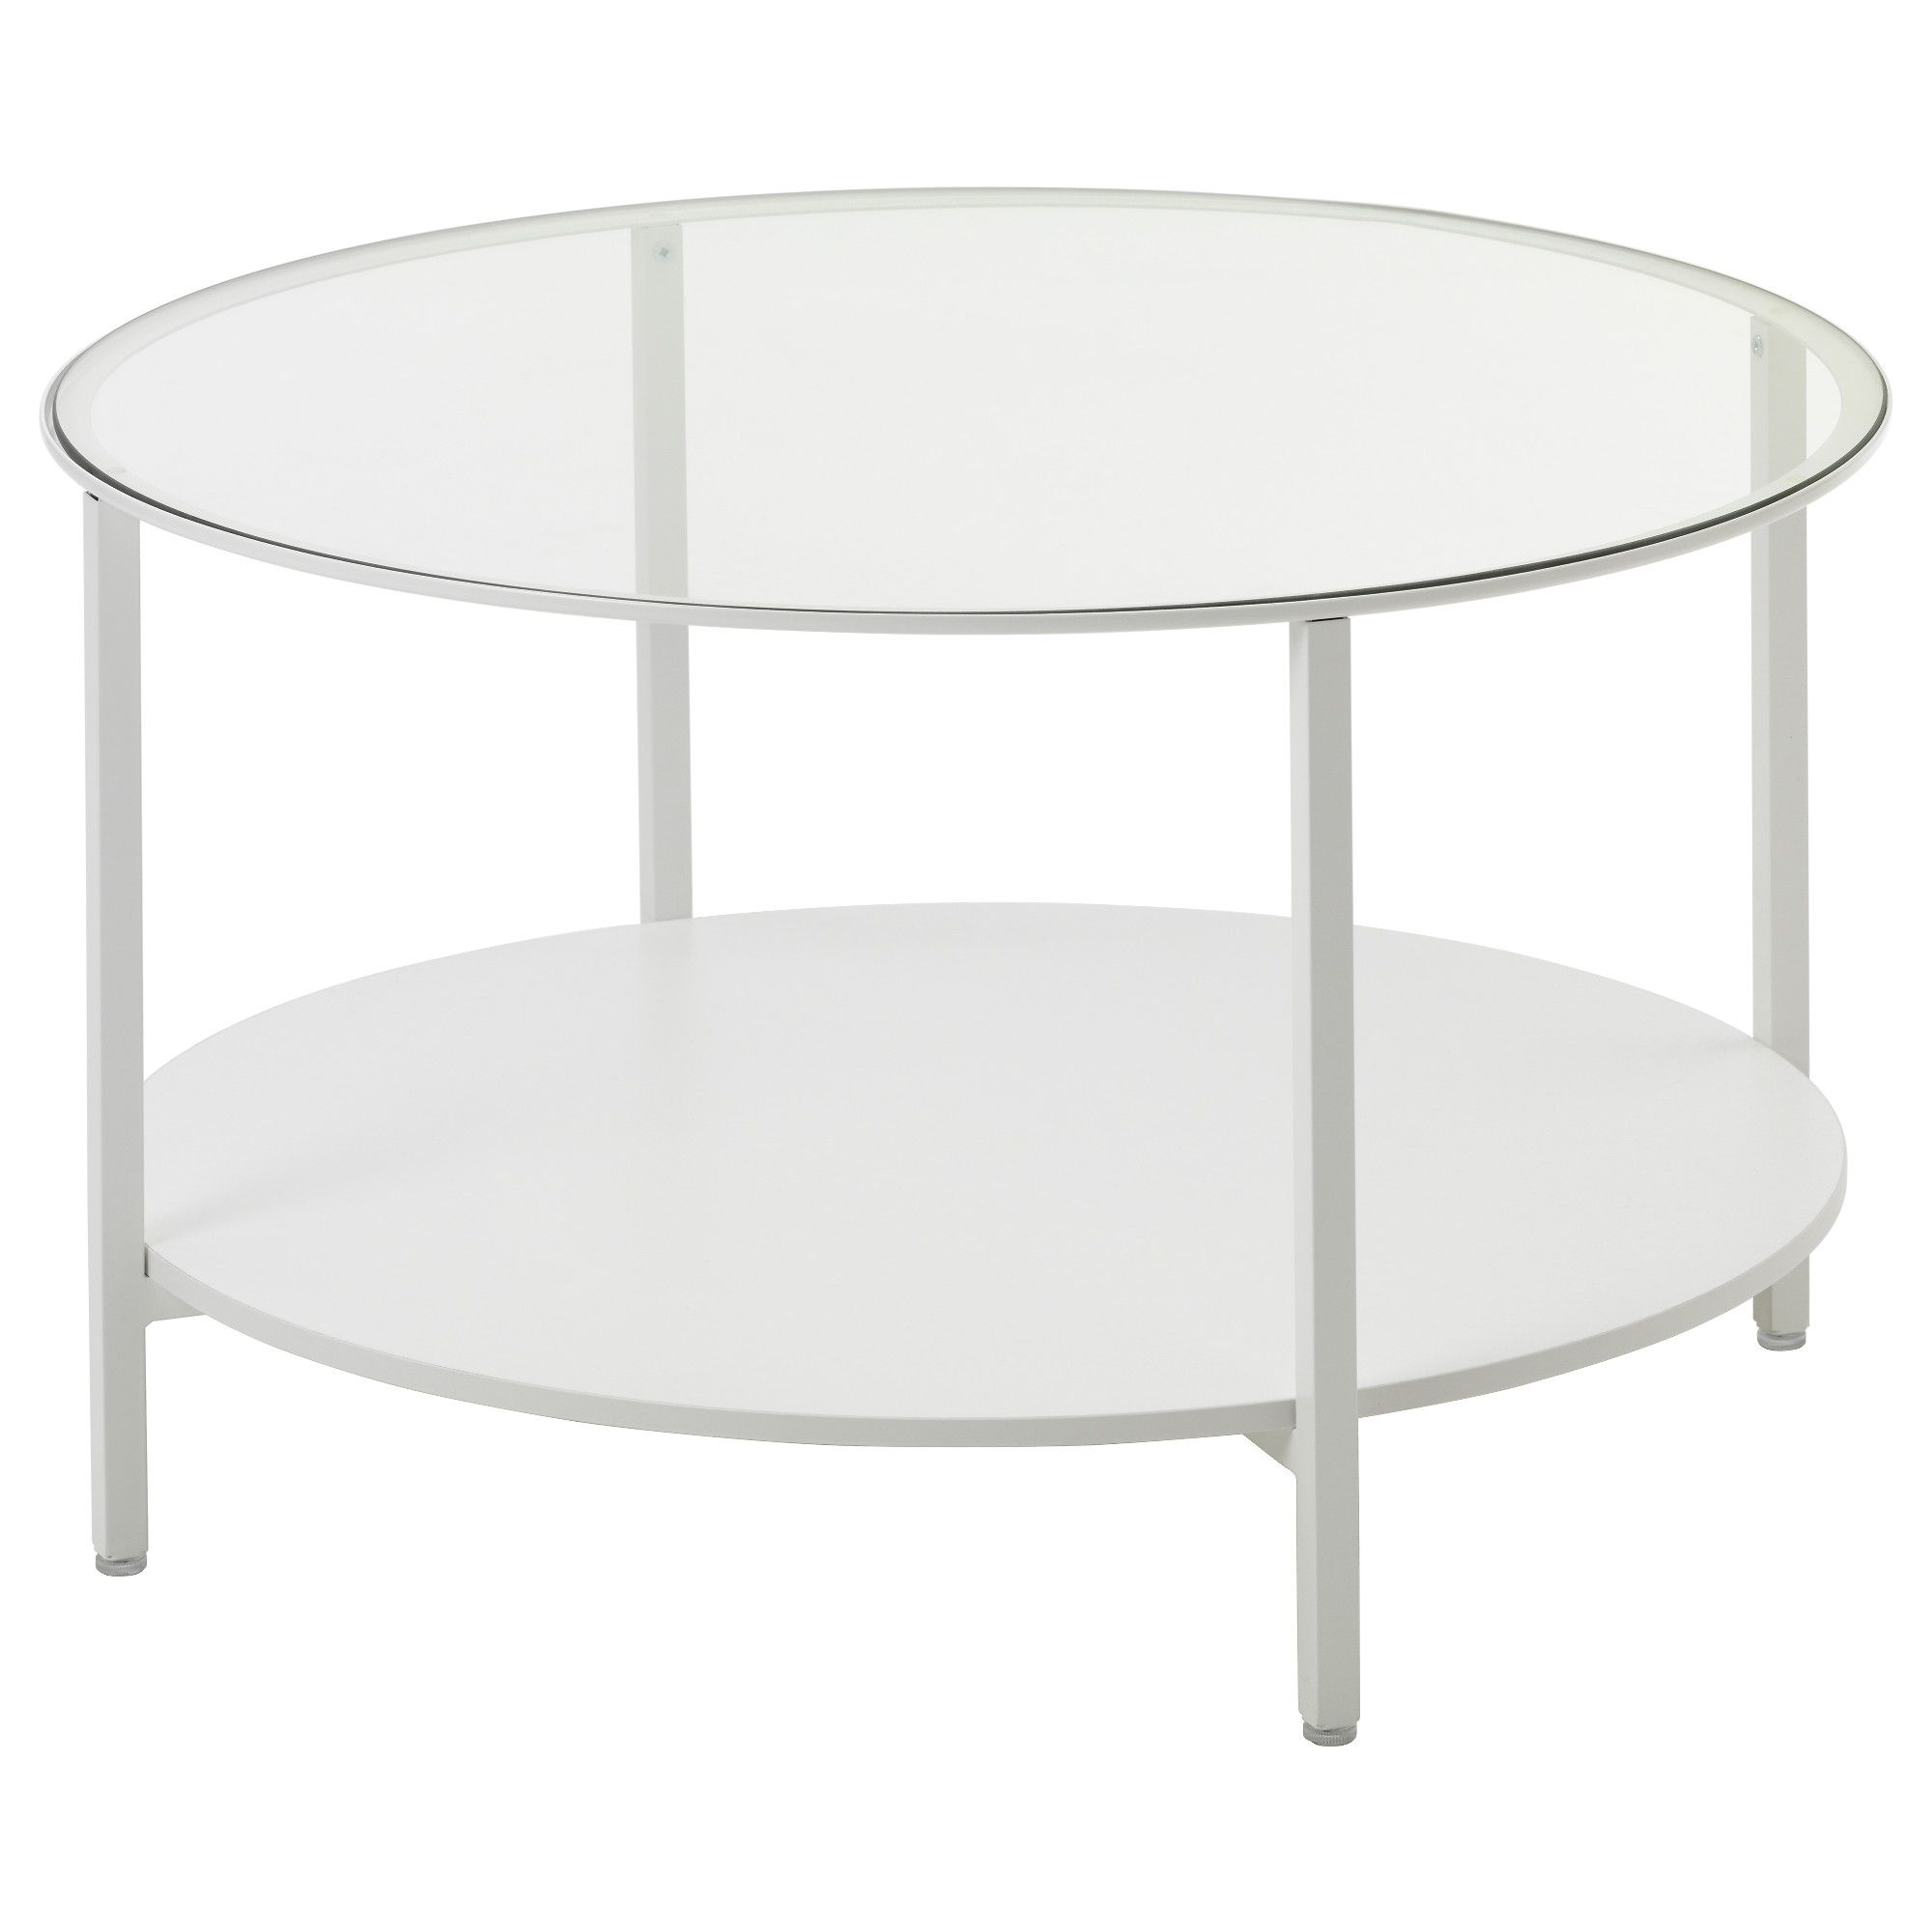 Vittsj Table Basse Blanc Verre Table Basse Blanc Pied  # Ikea Plateau En Verre